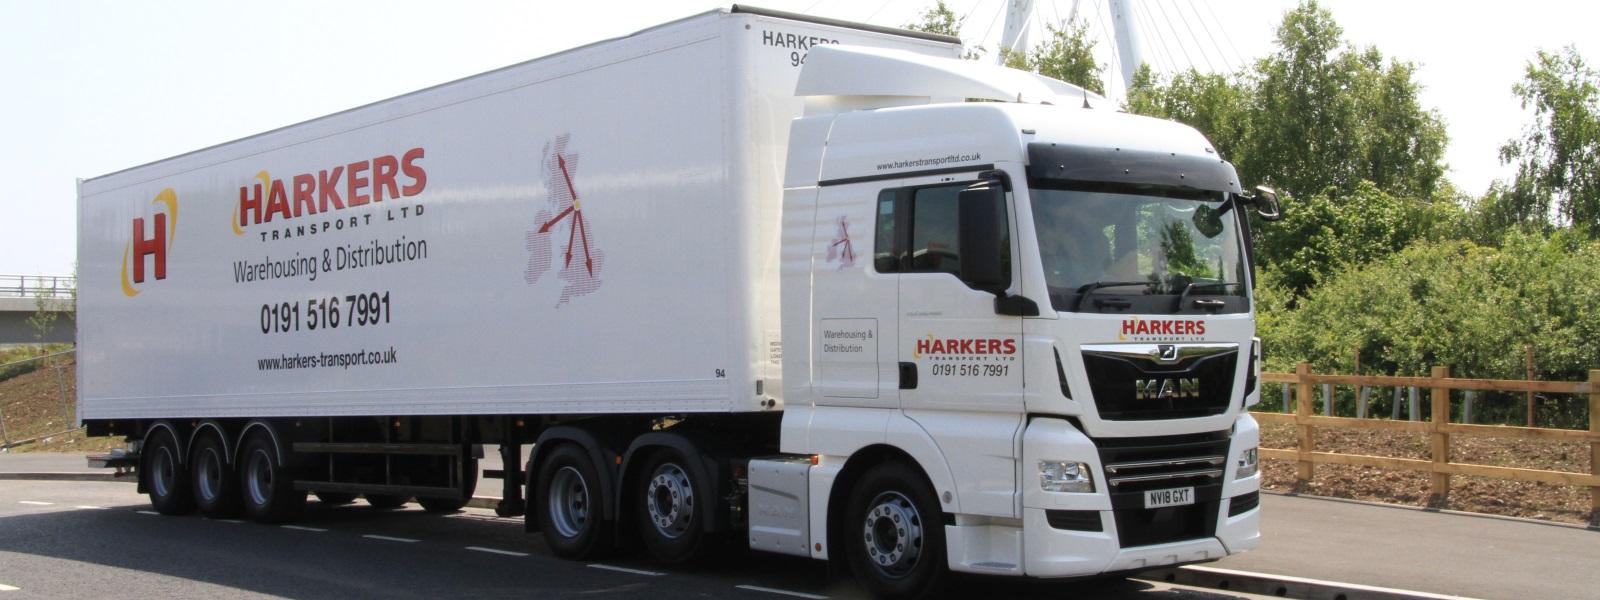 Harkers Transport Ltd